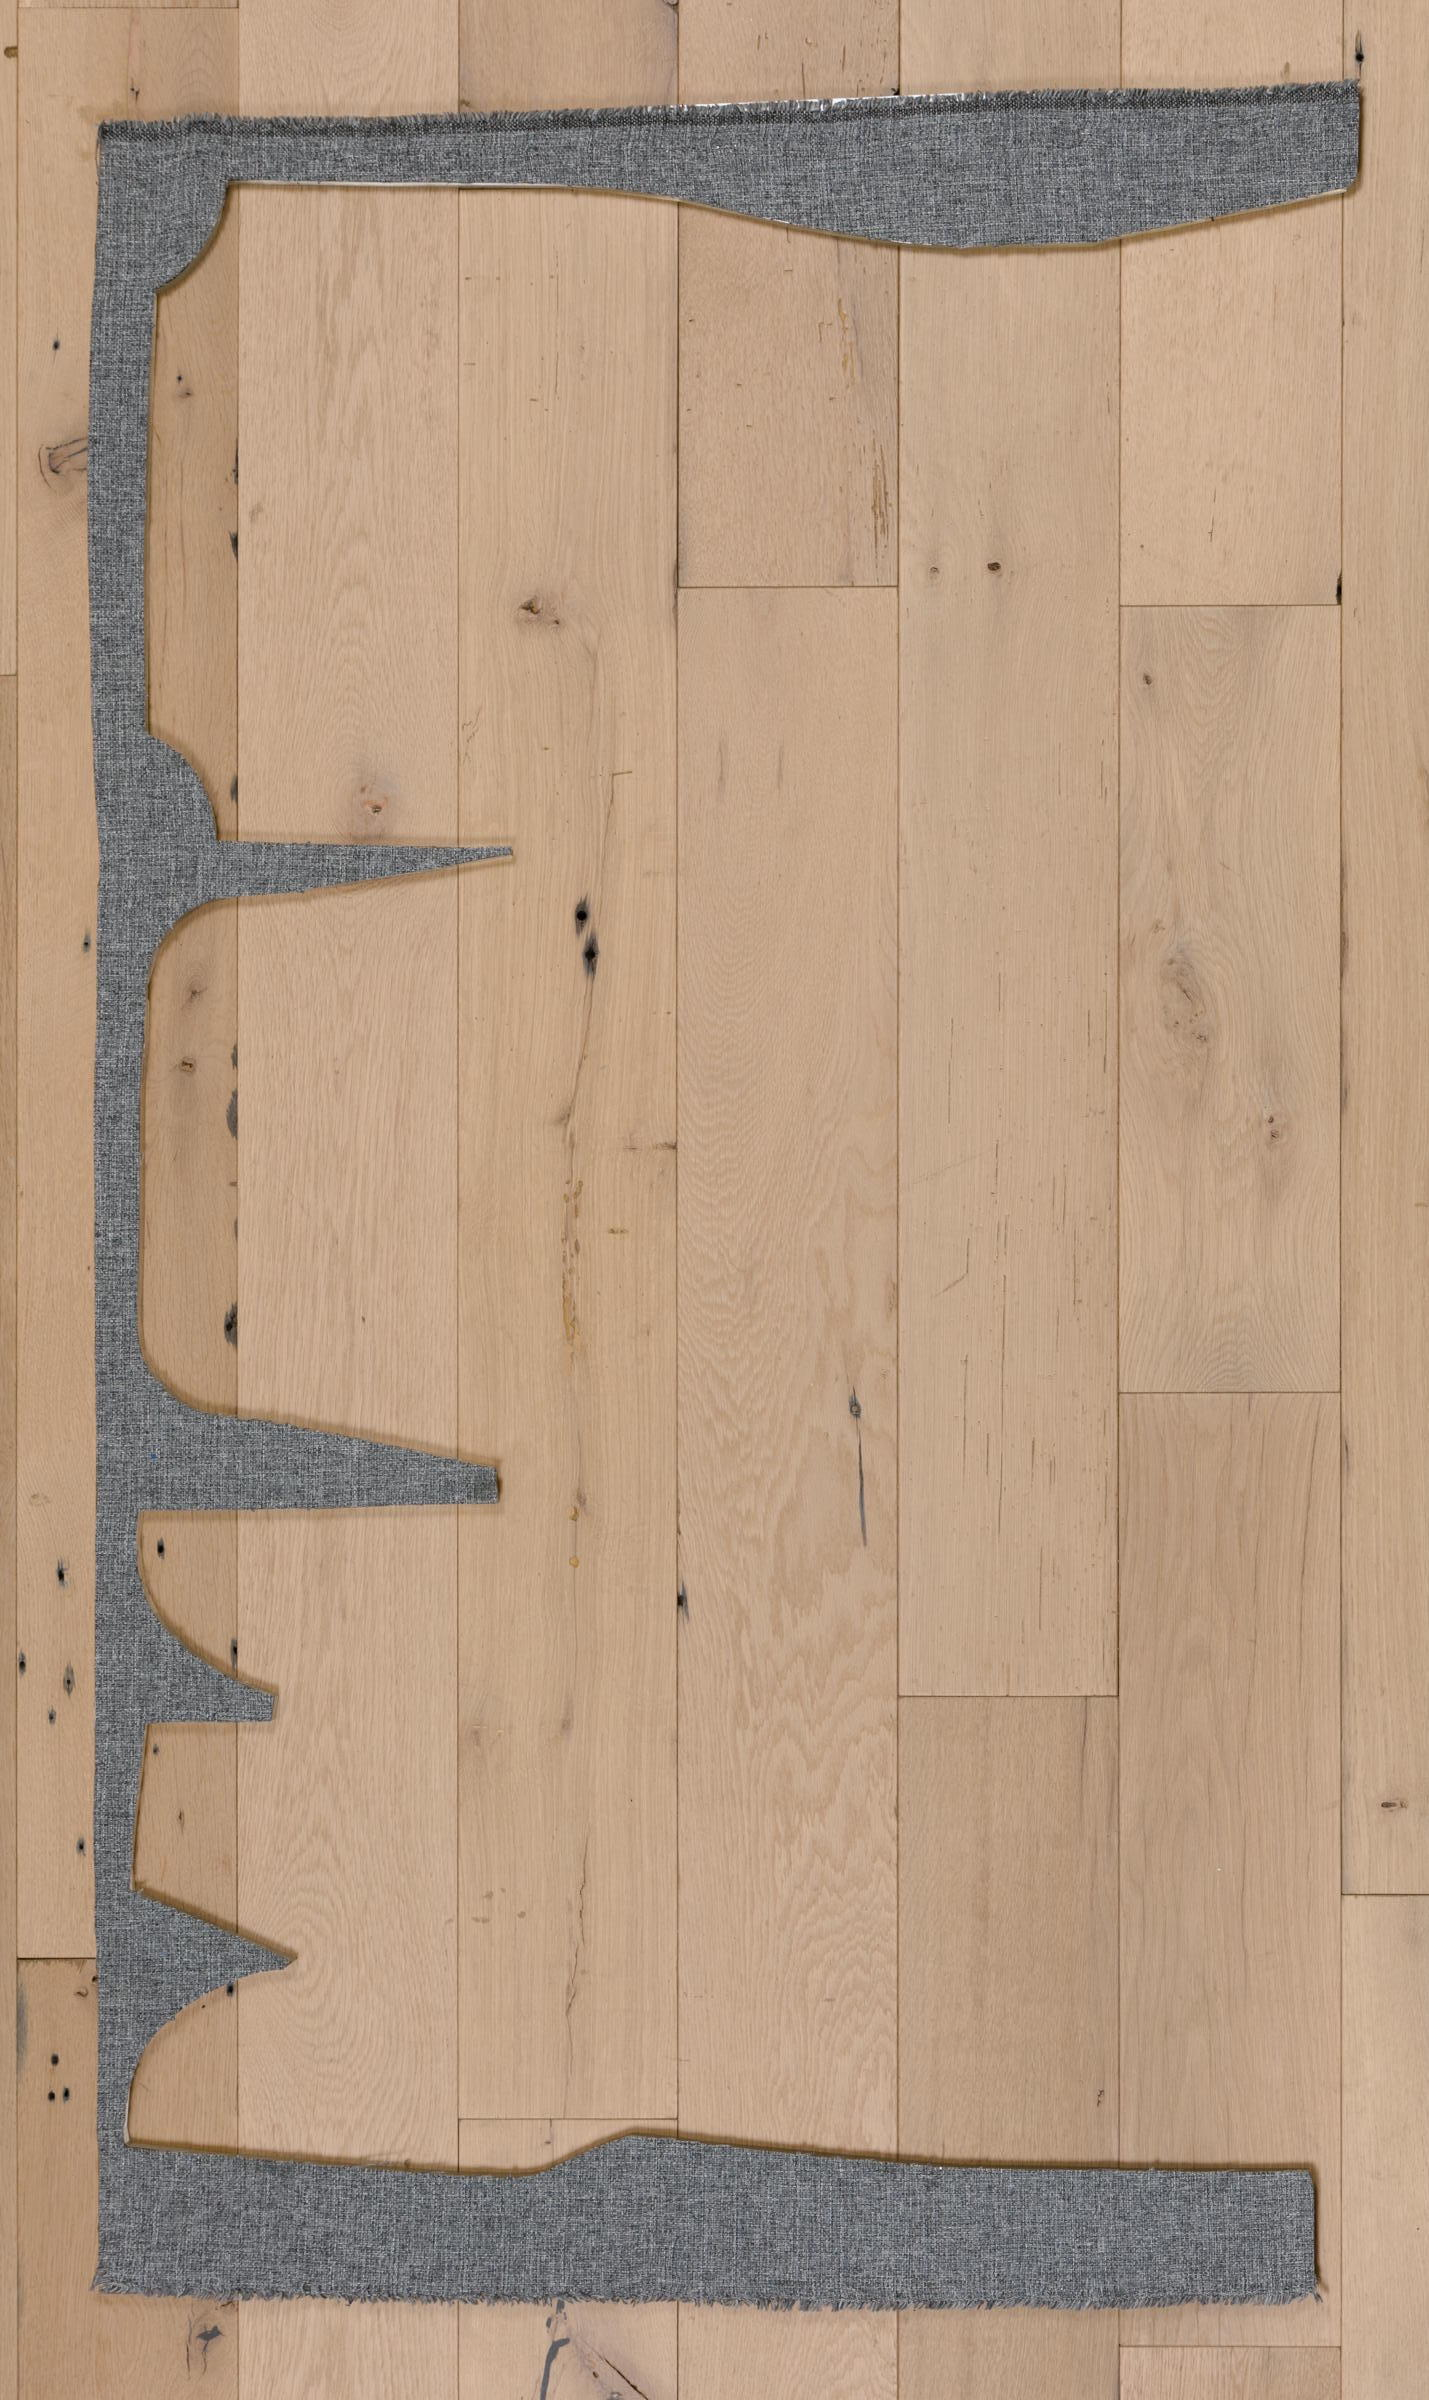 Jessica Vaughn,   Pacific Grey No. 48306 , 2017, fabric scraps procured from manufacturer (09/2015-11/2016) on plexi, 33 × 59 × ½ in.